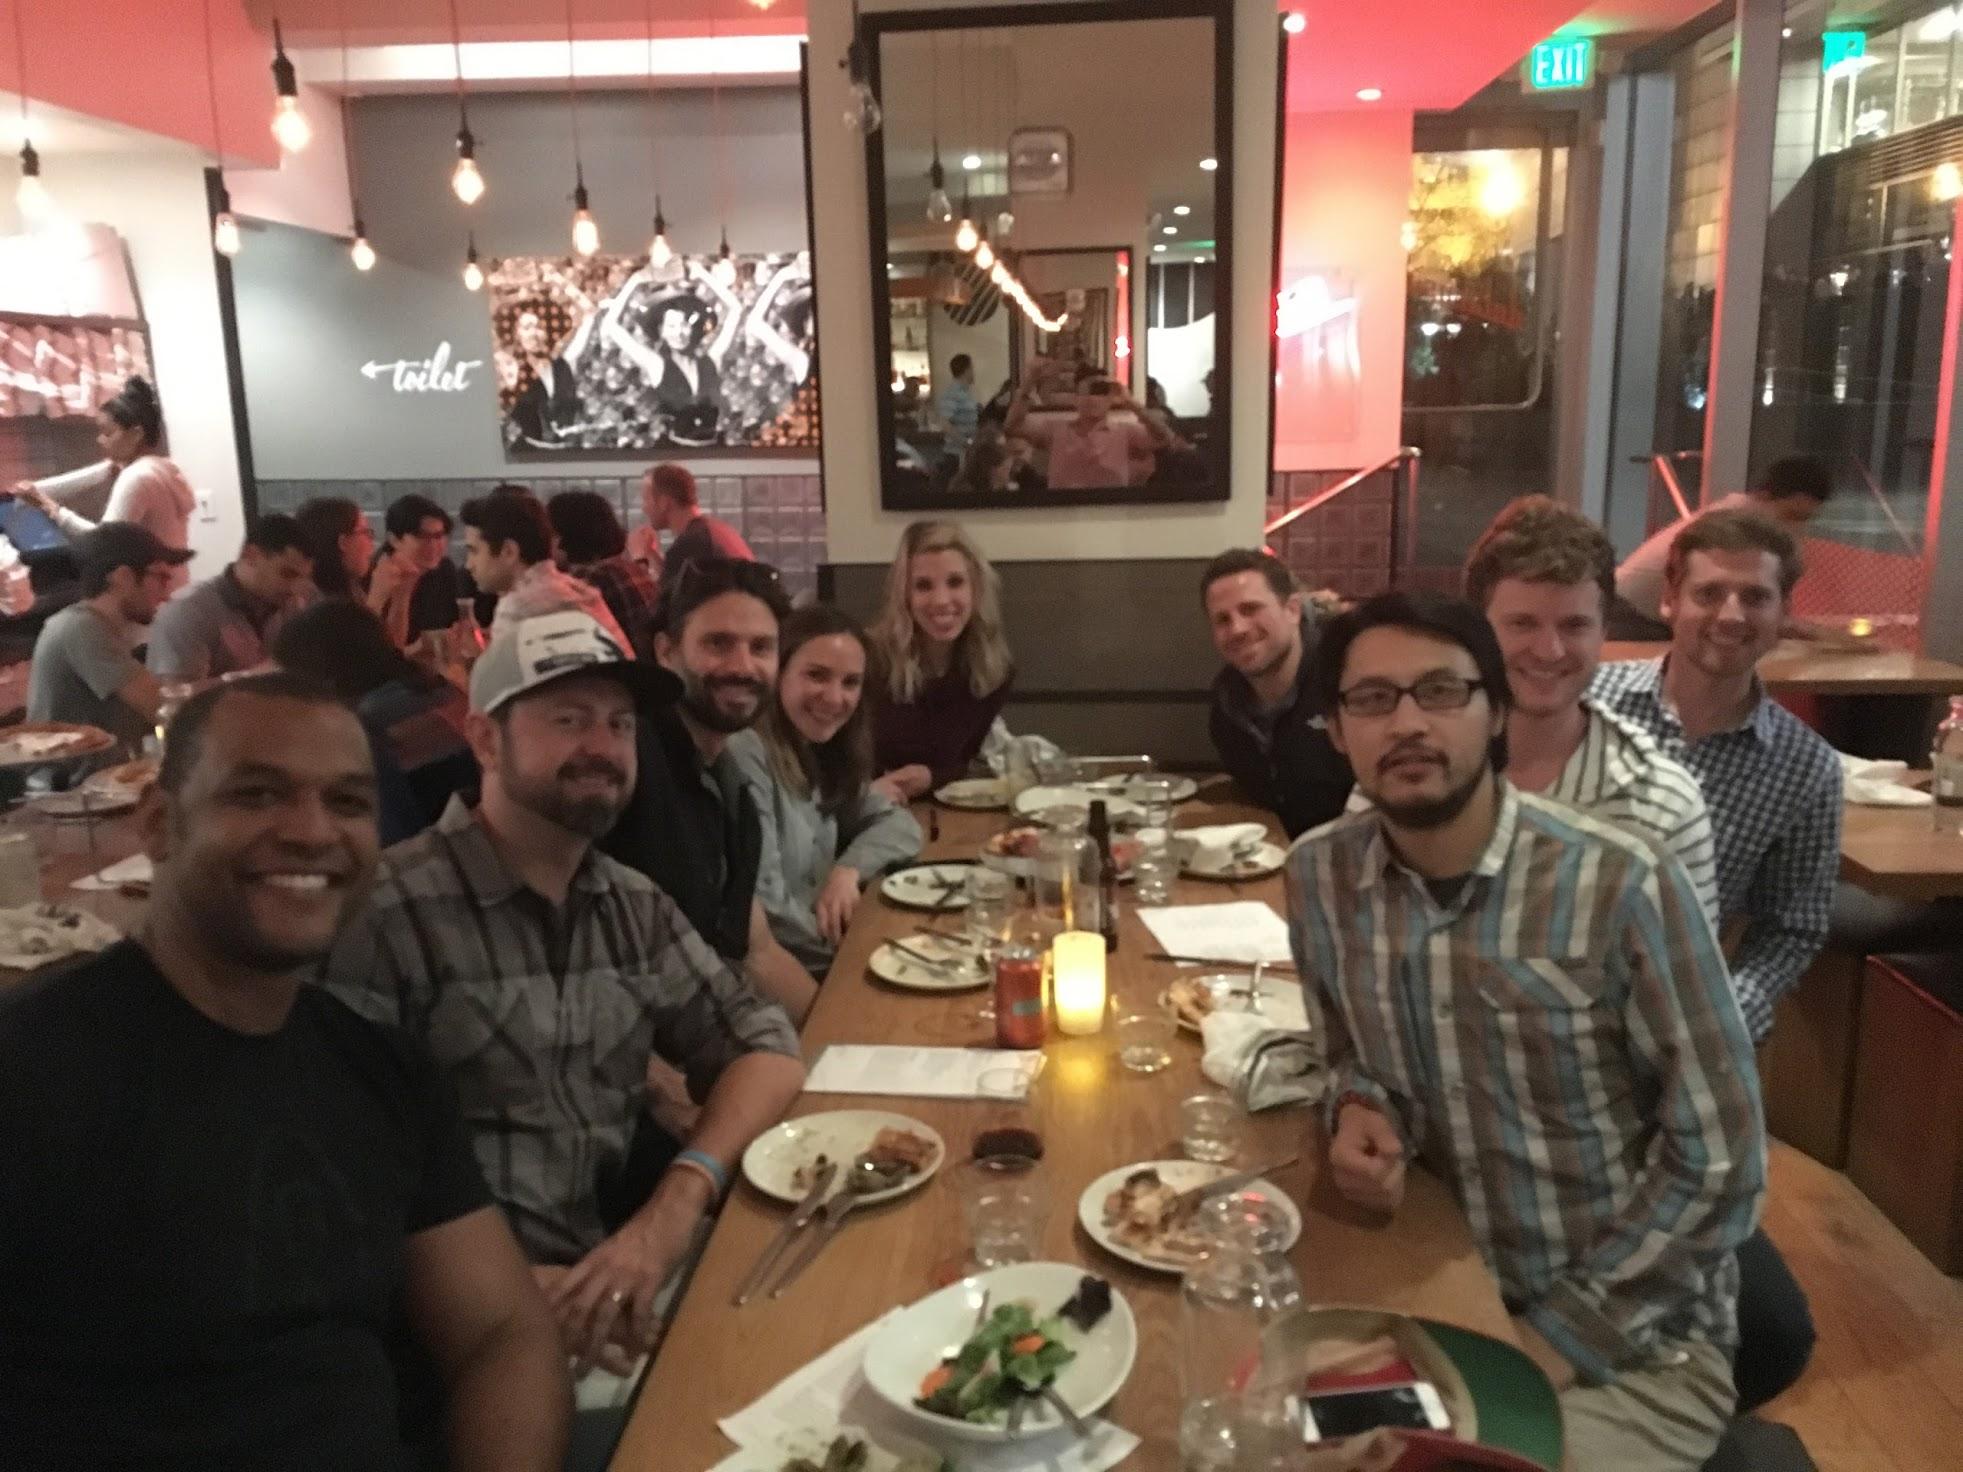 CloudApp team at dinner